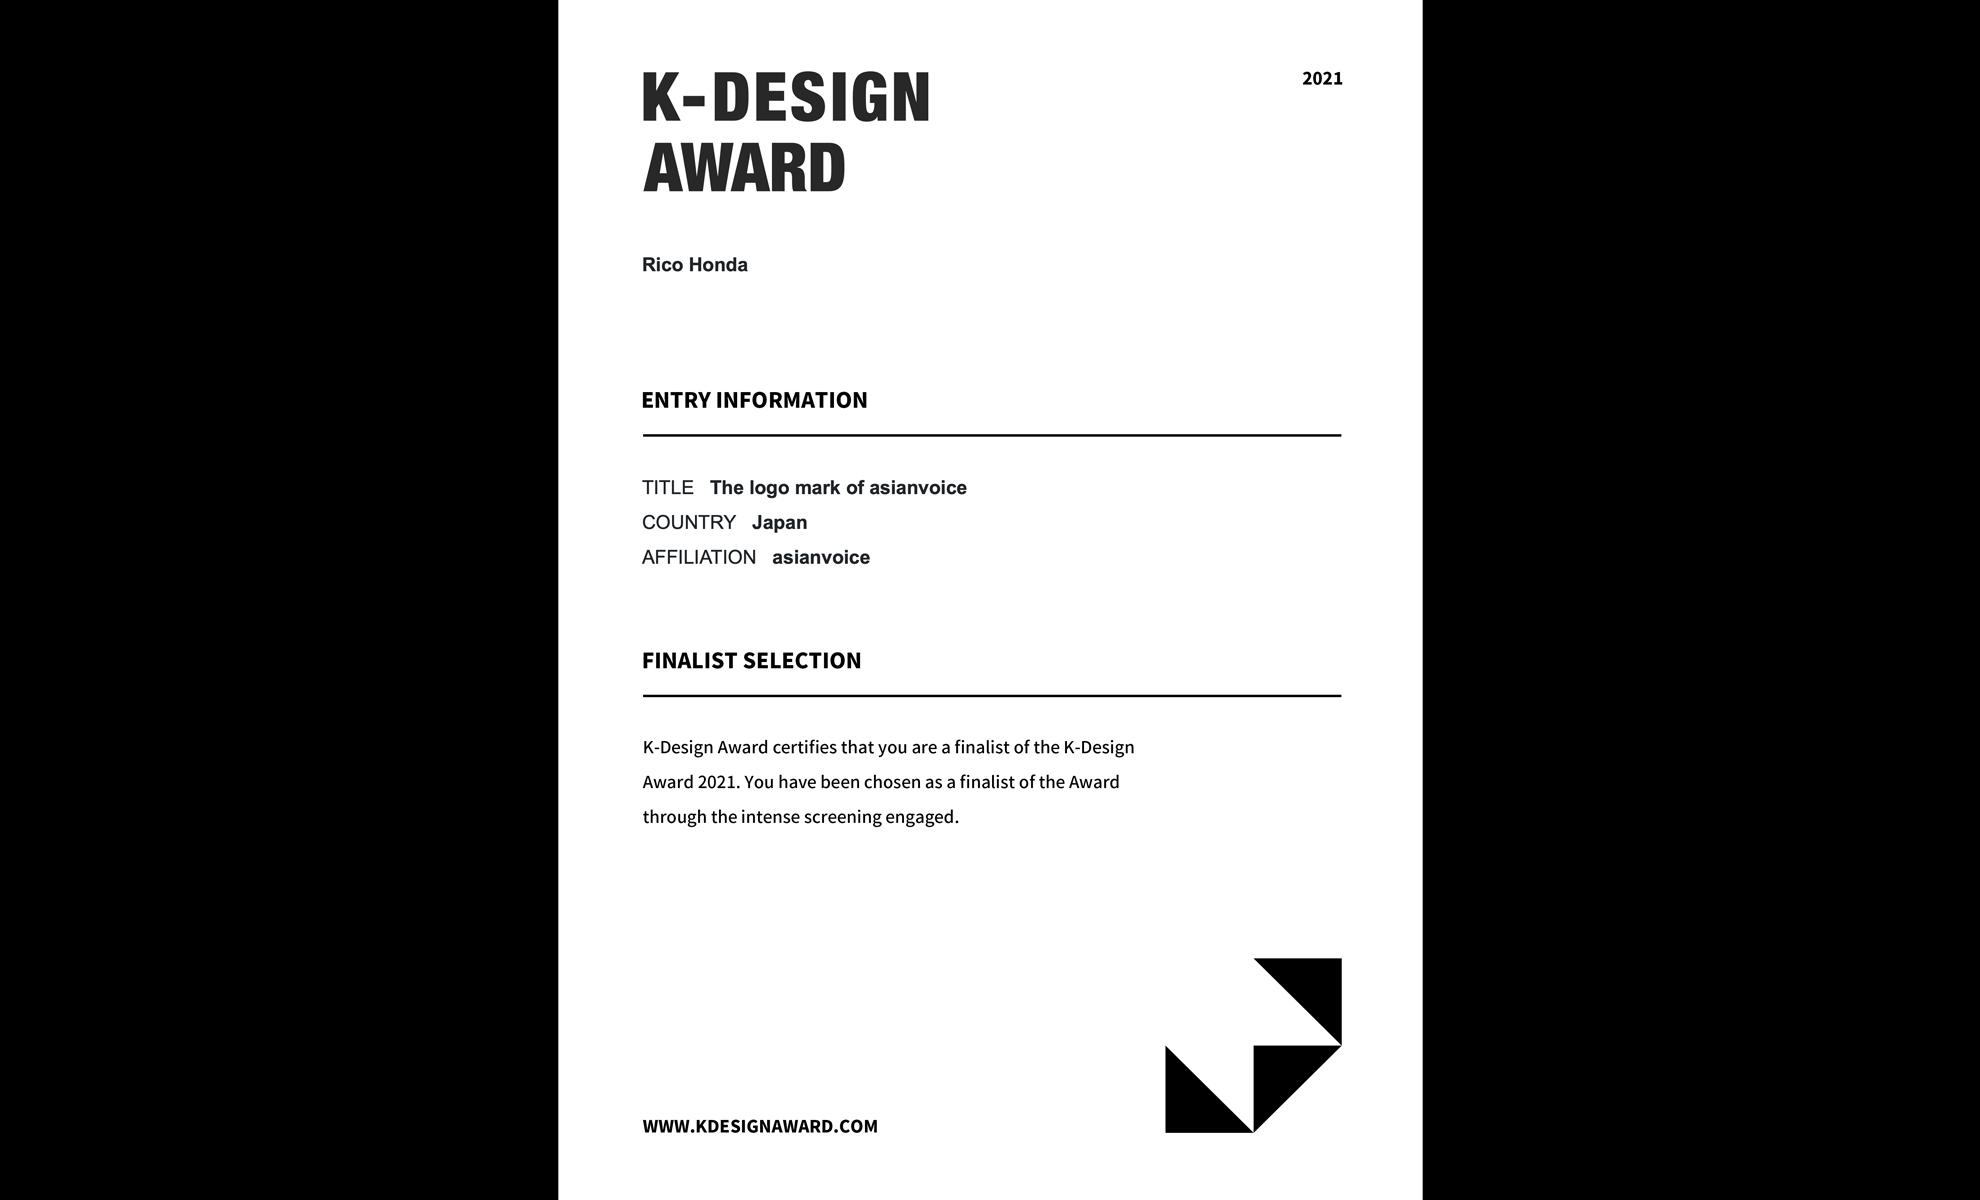 k-design award 2021